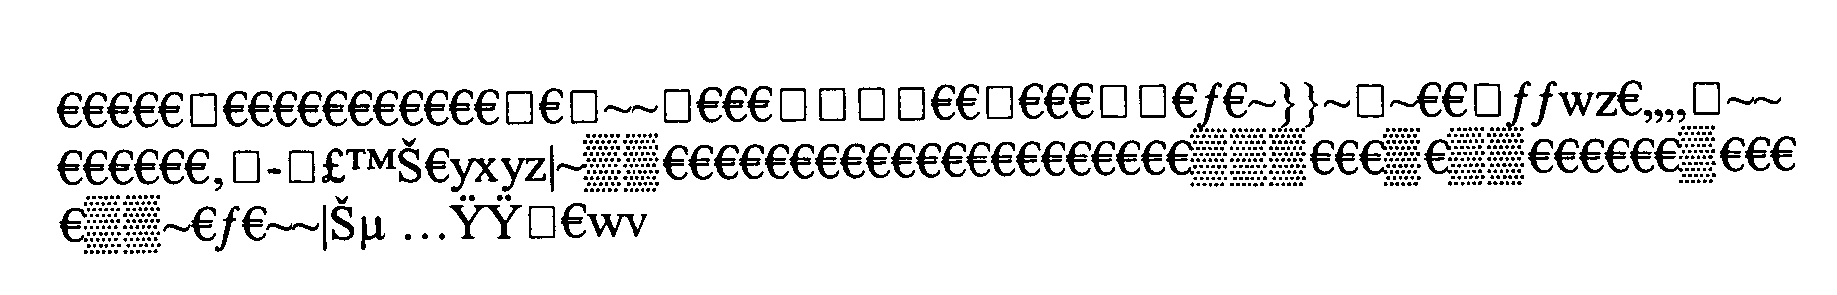 Figure US20050192838A1-20050901-P00002